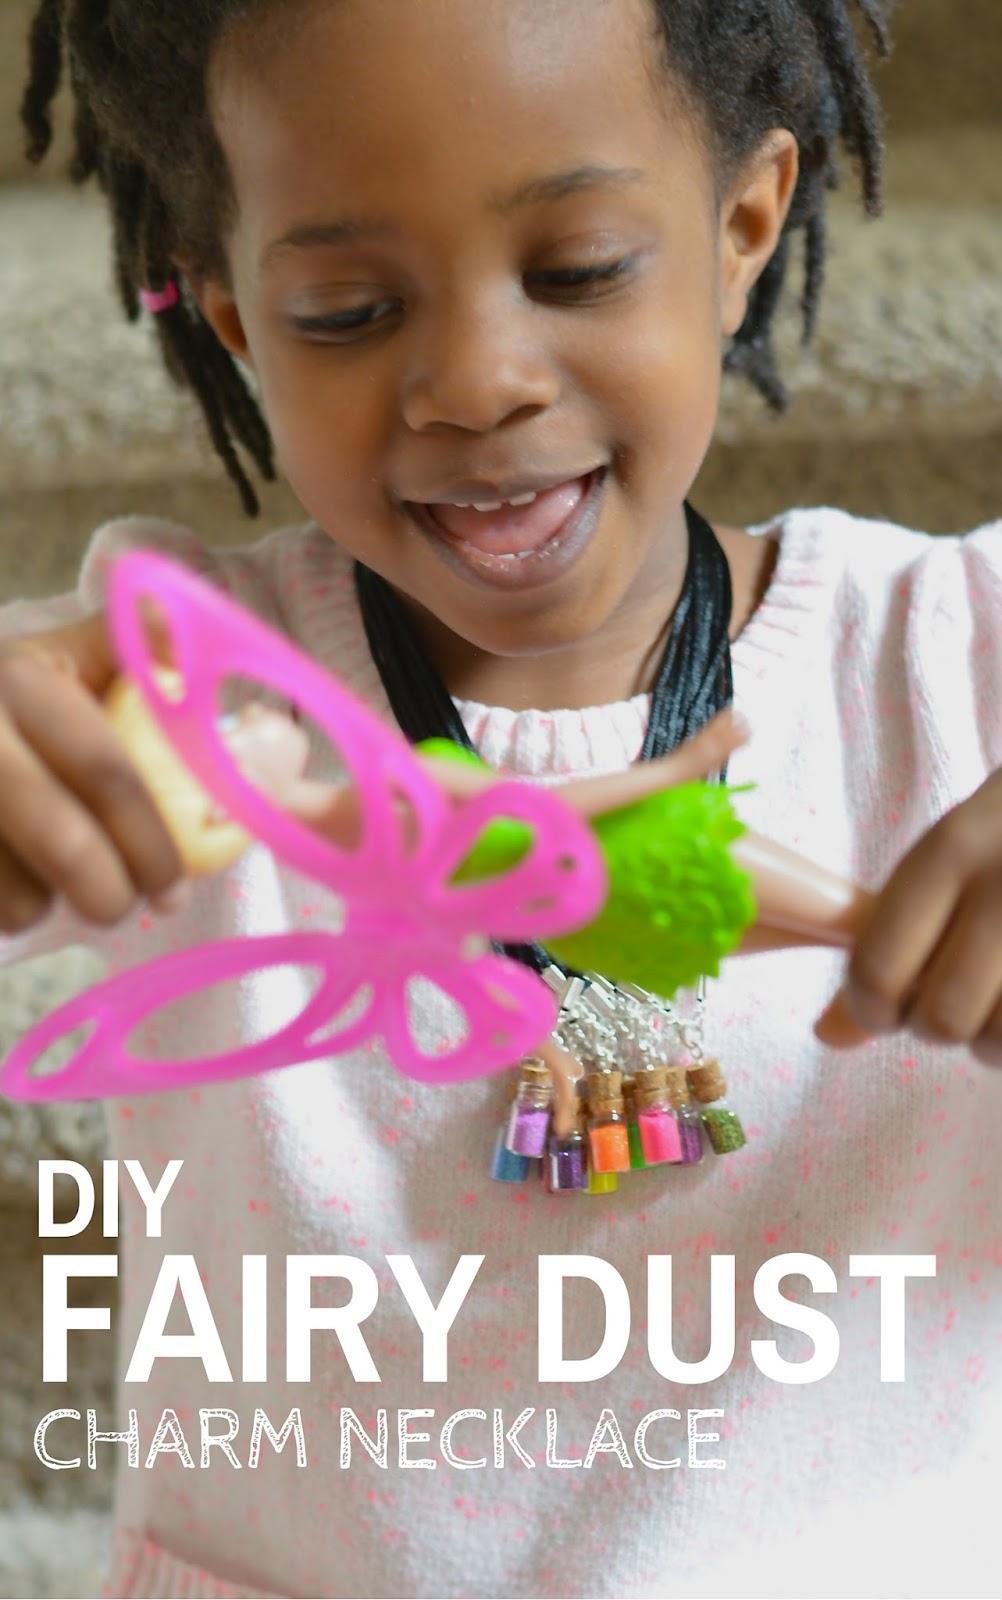 diy fairy dust charm necklace #shop